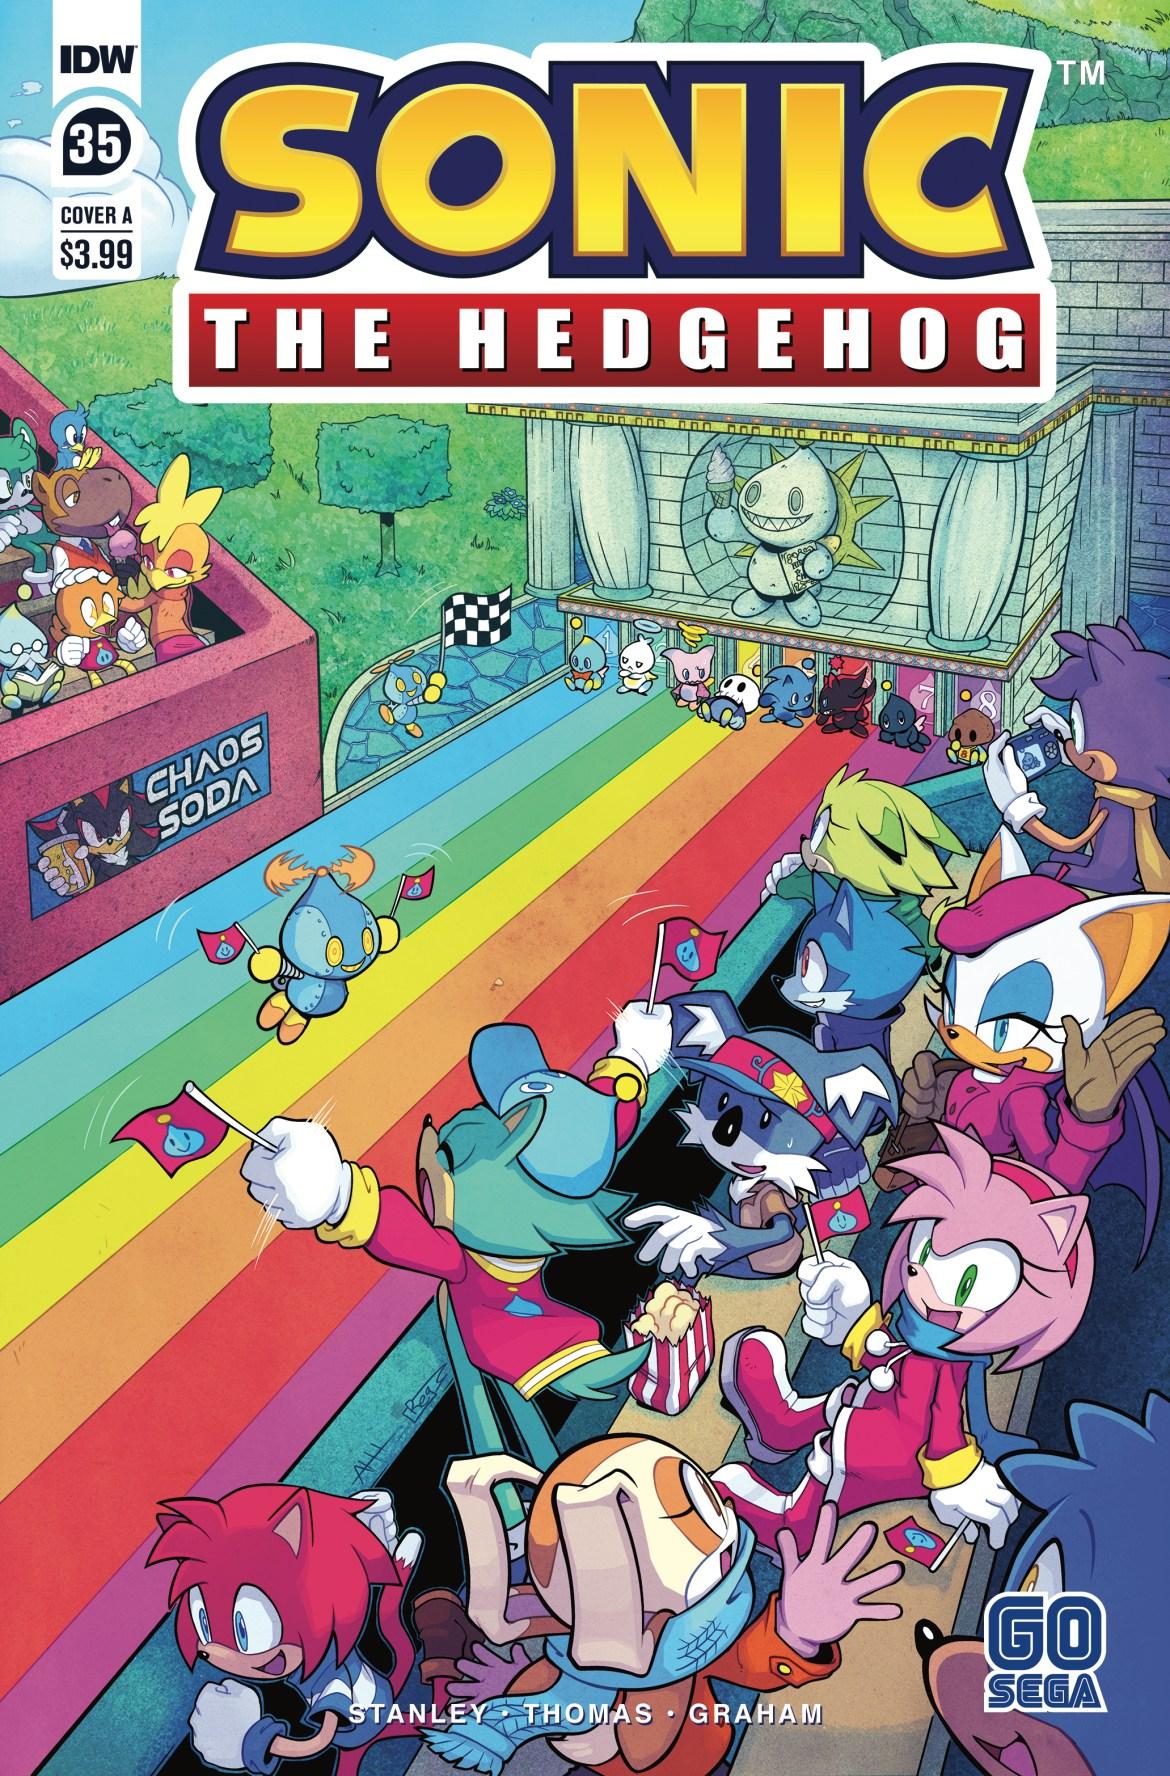 STH35_cvrA ComicList Previews: SONIC THE HEDGEHOG #35